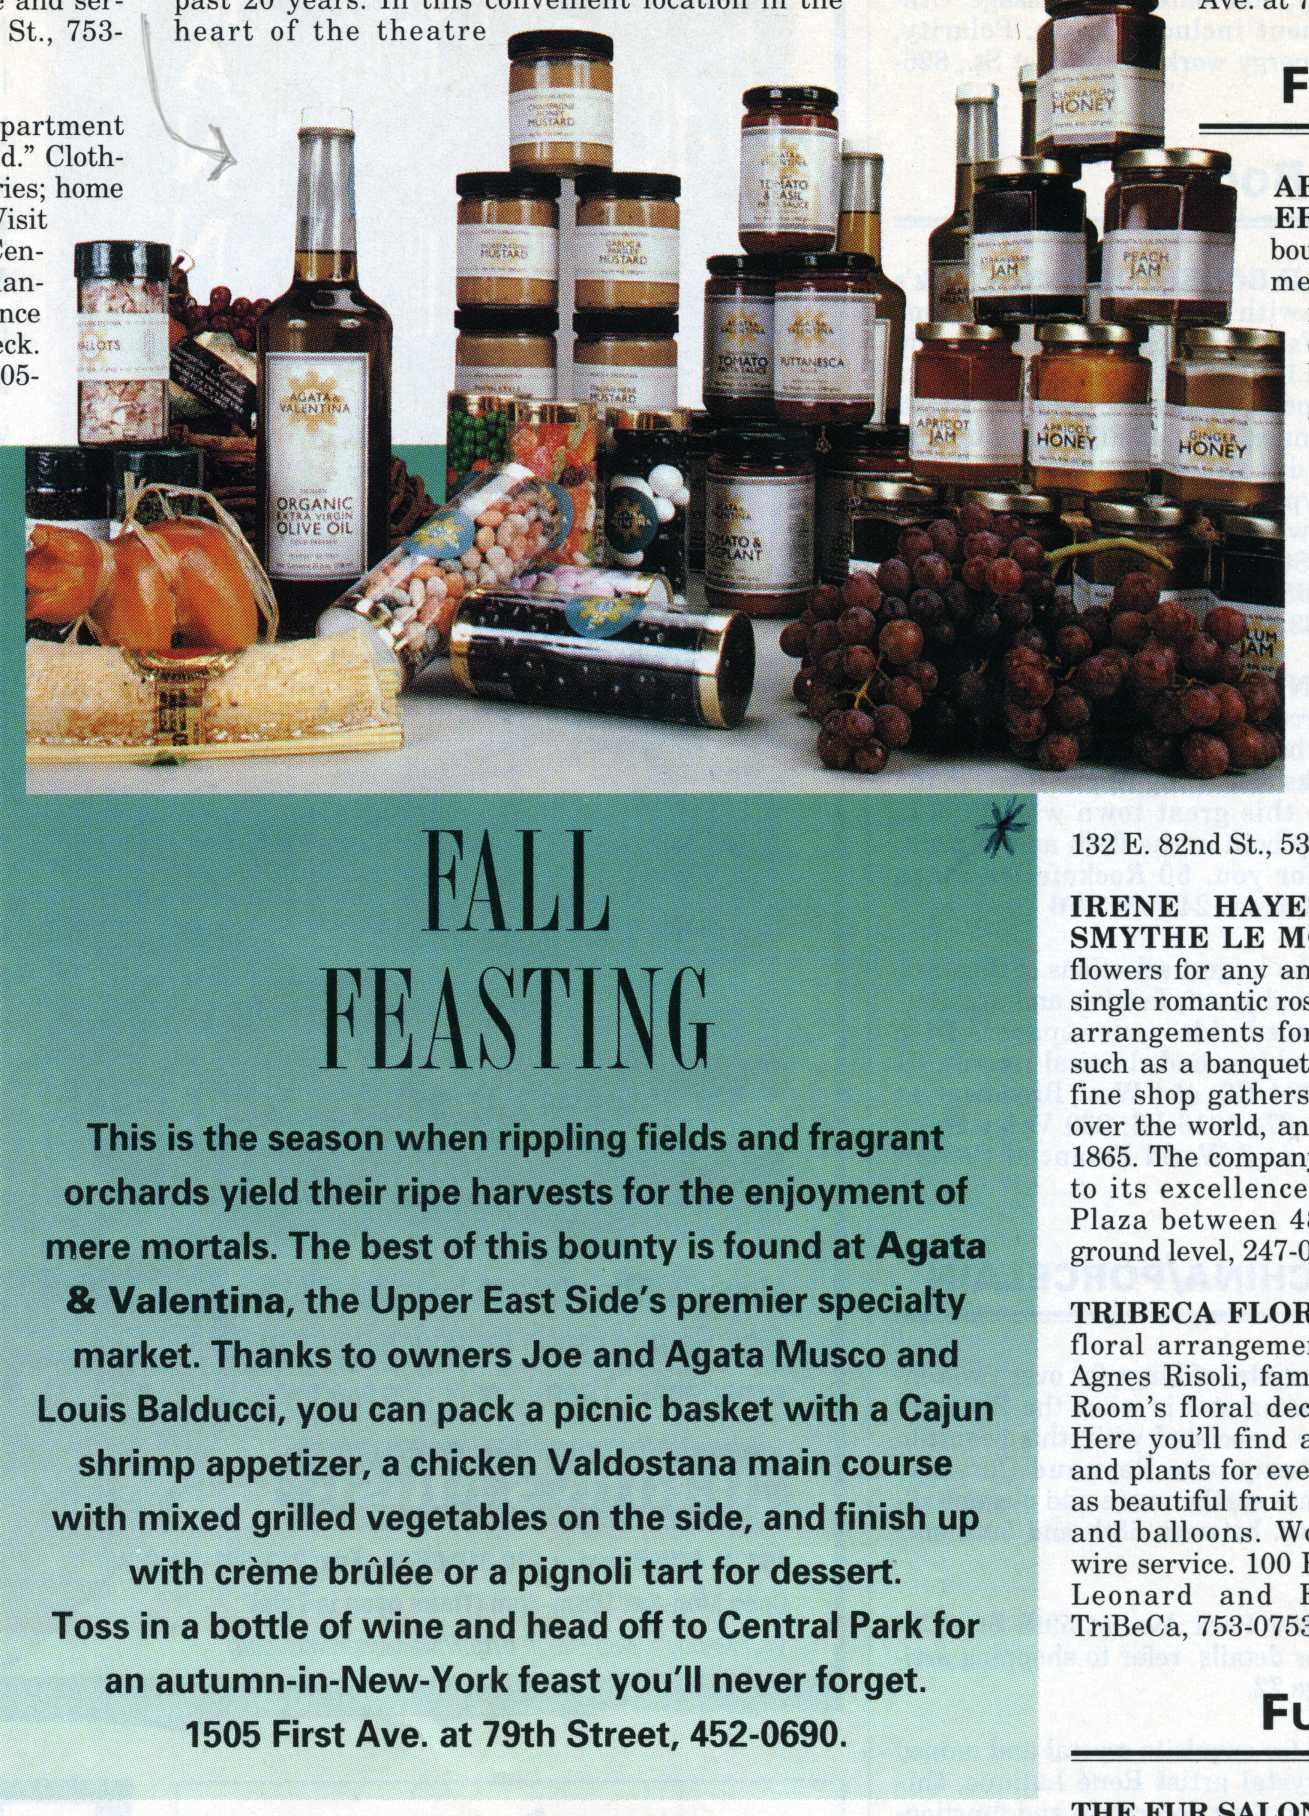 Fall Feasting